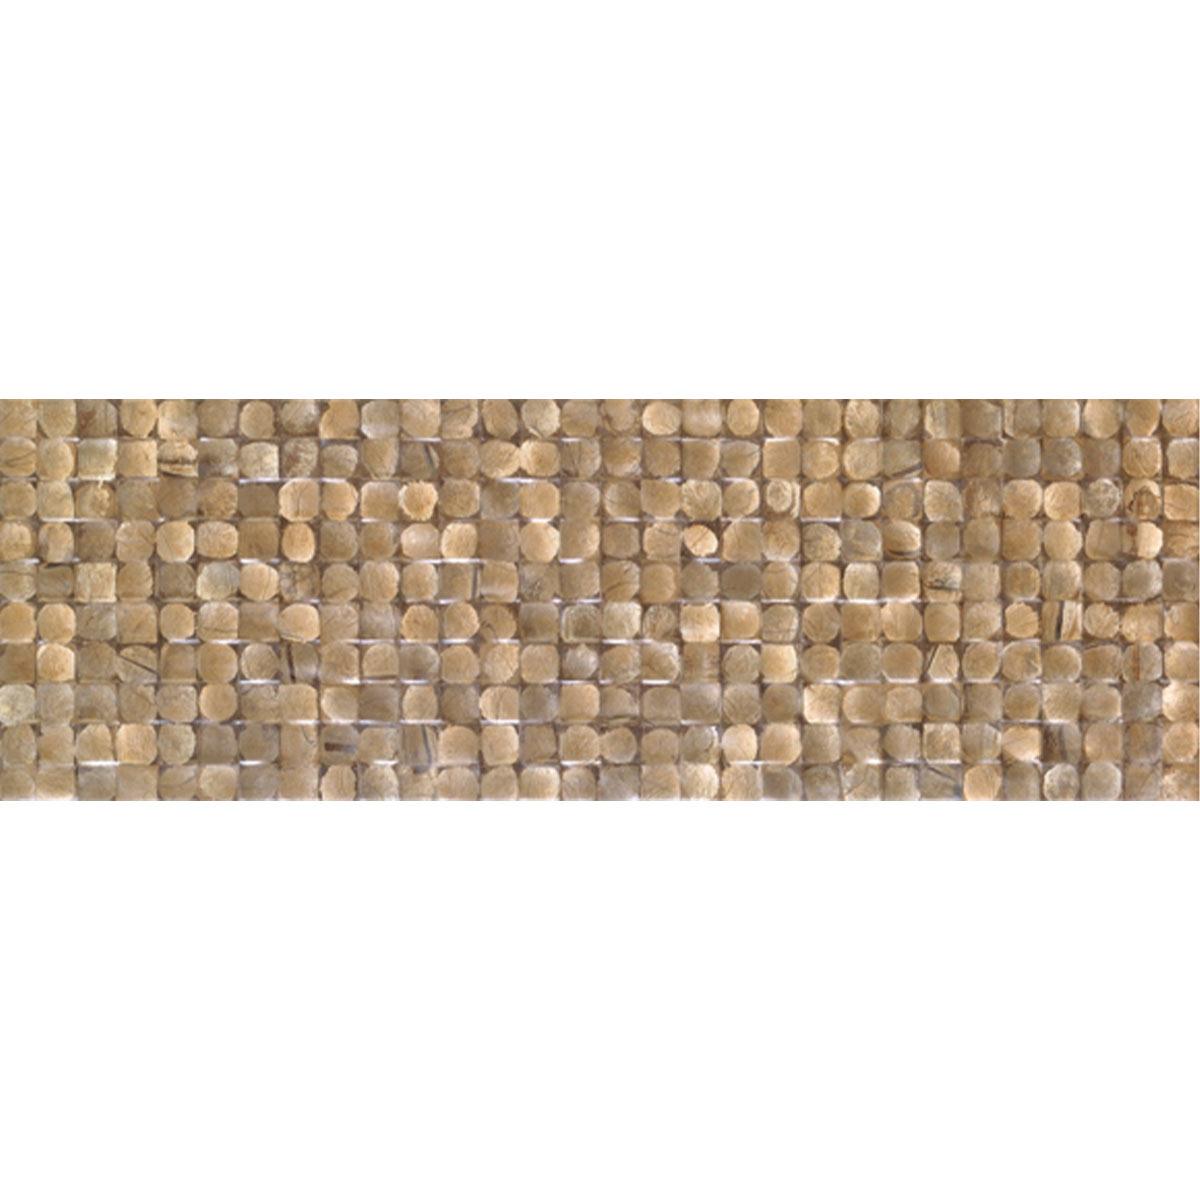 D00242 COCONUT BROWN FOCUS